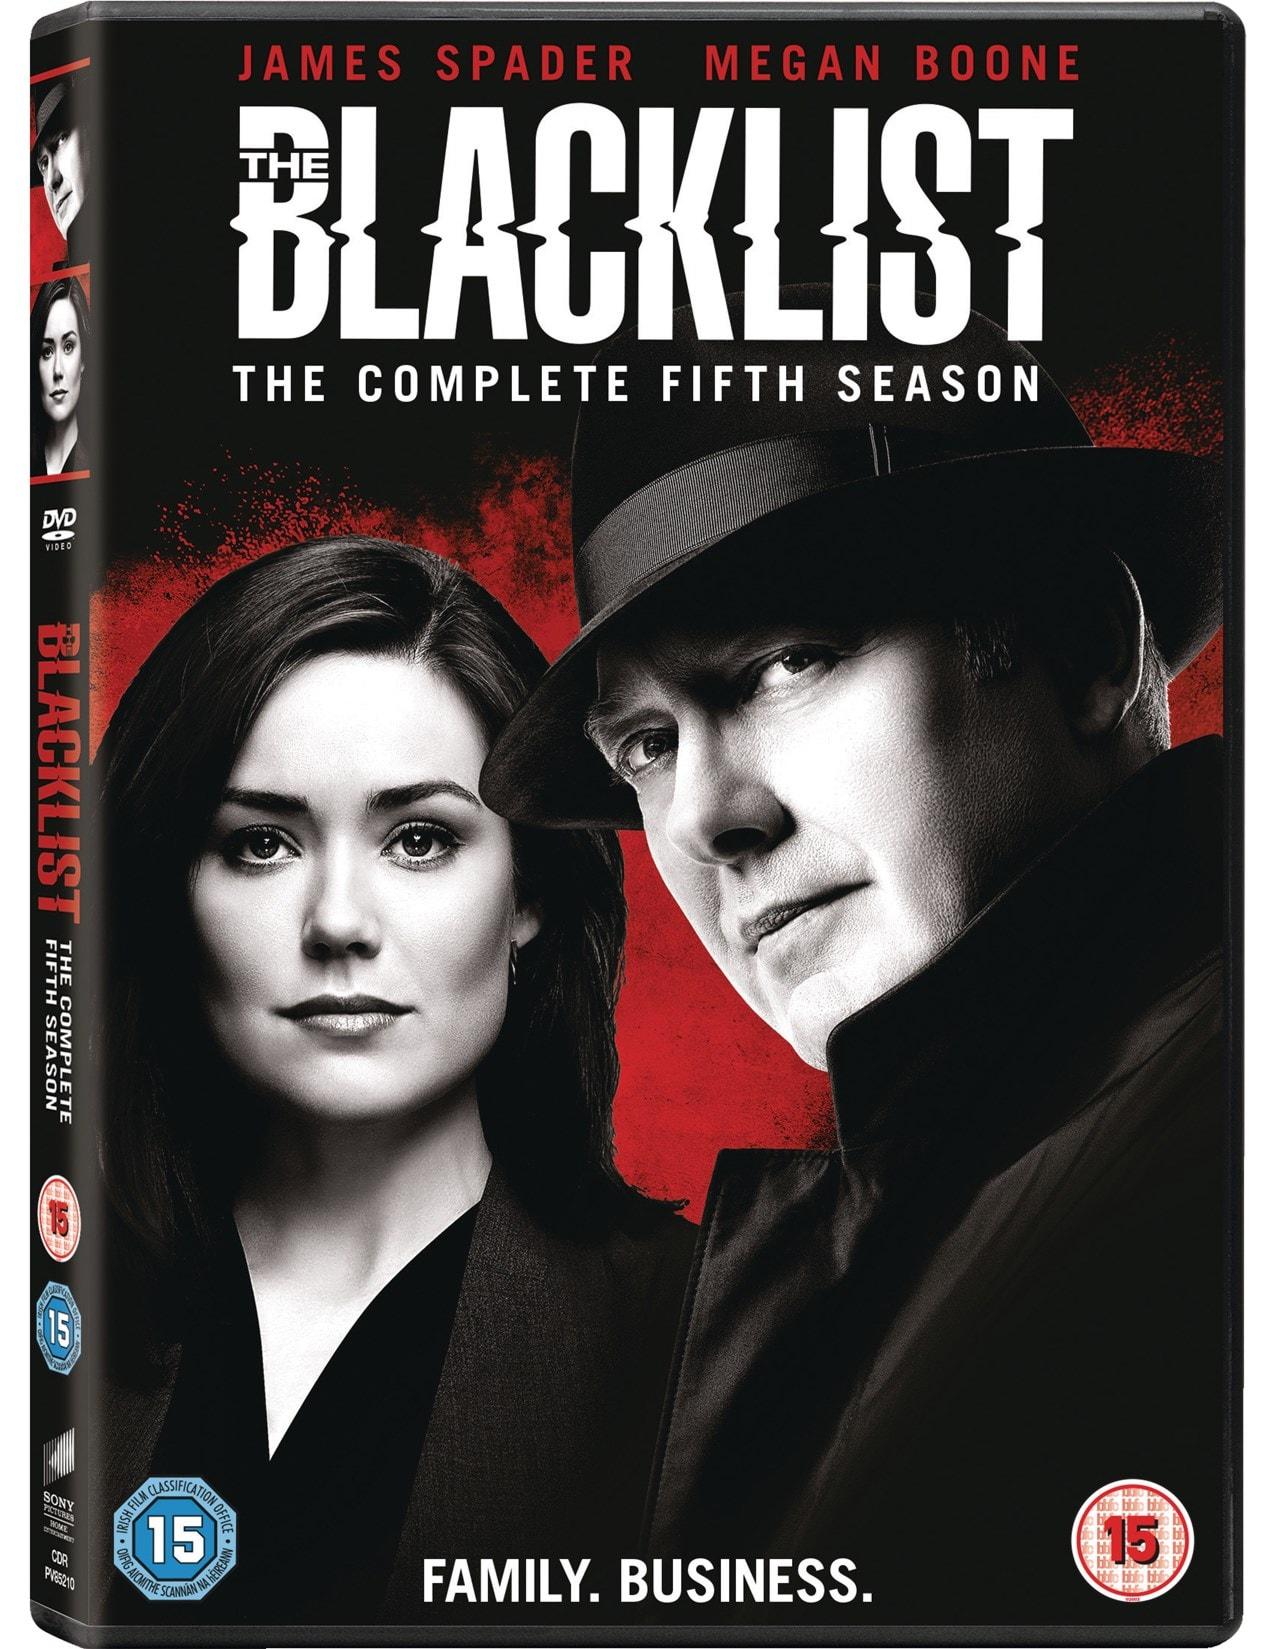 The Blacklist: The Complete Fifth Season - 2